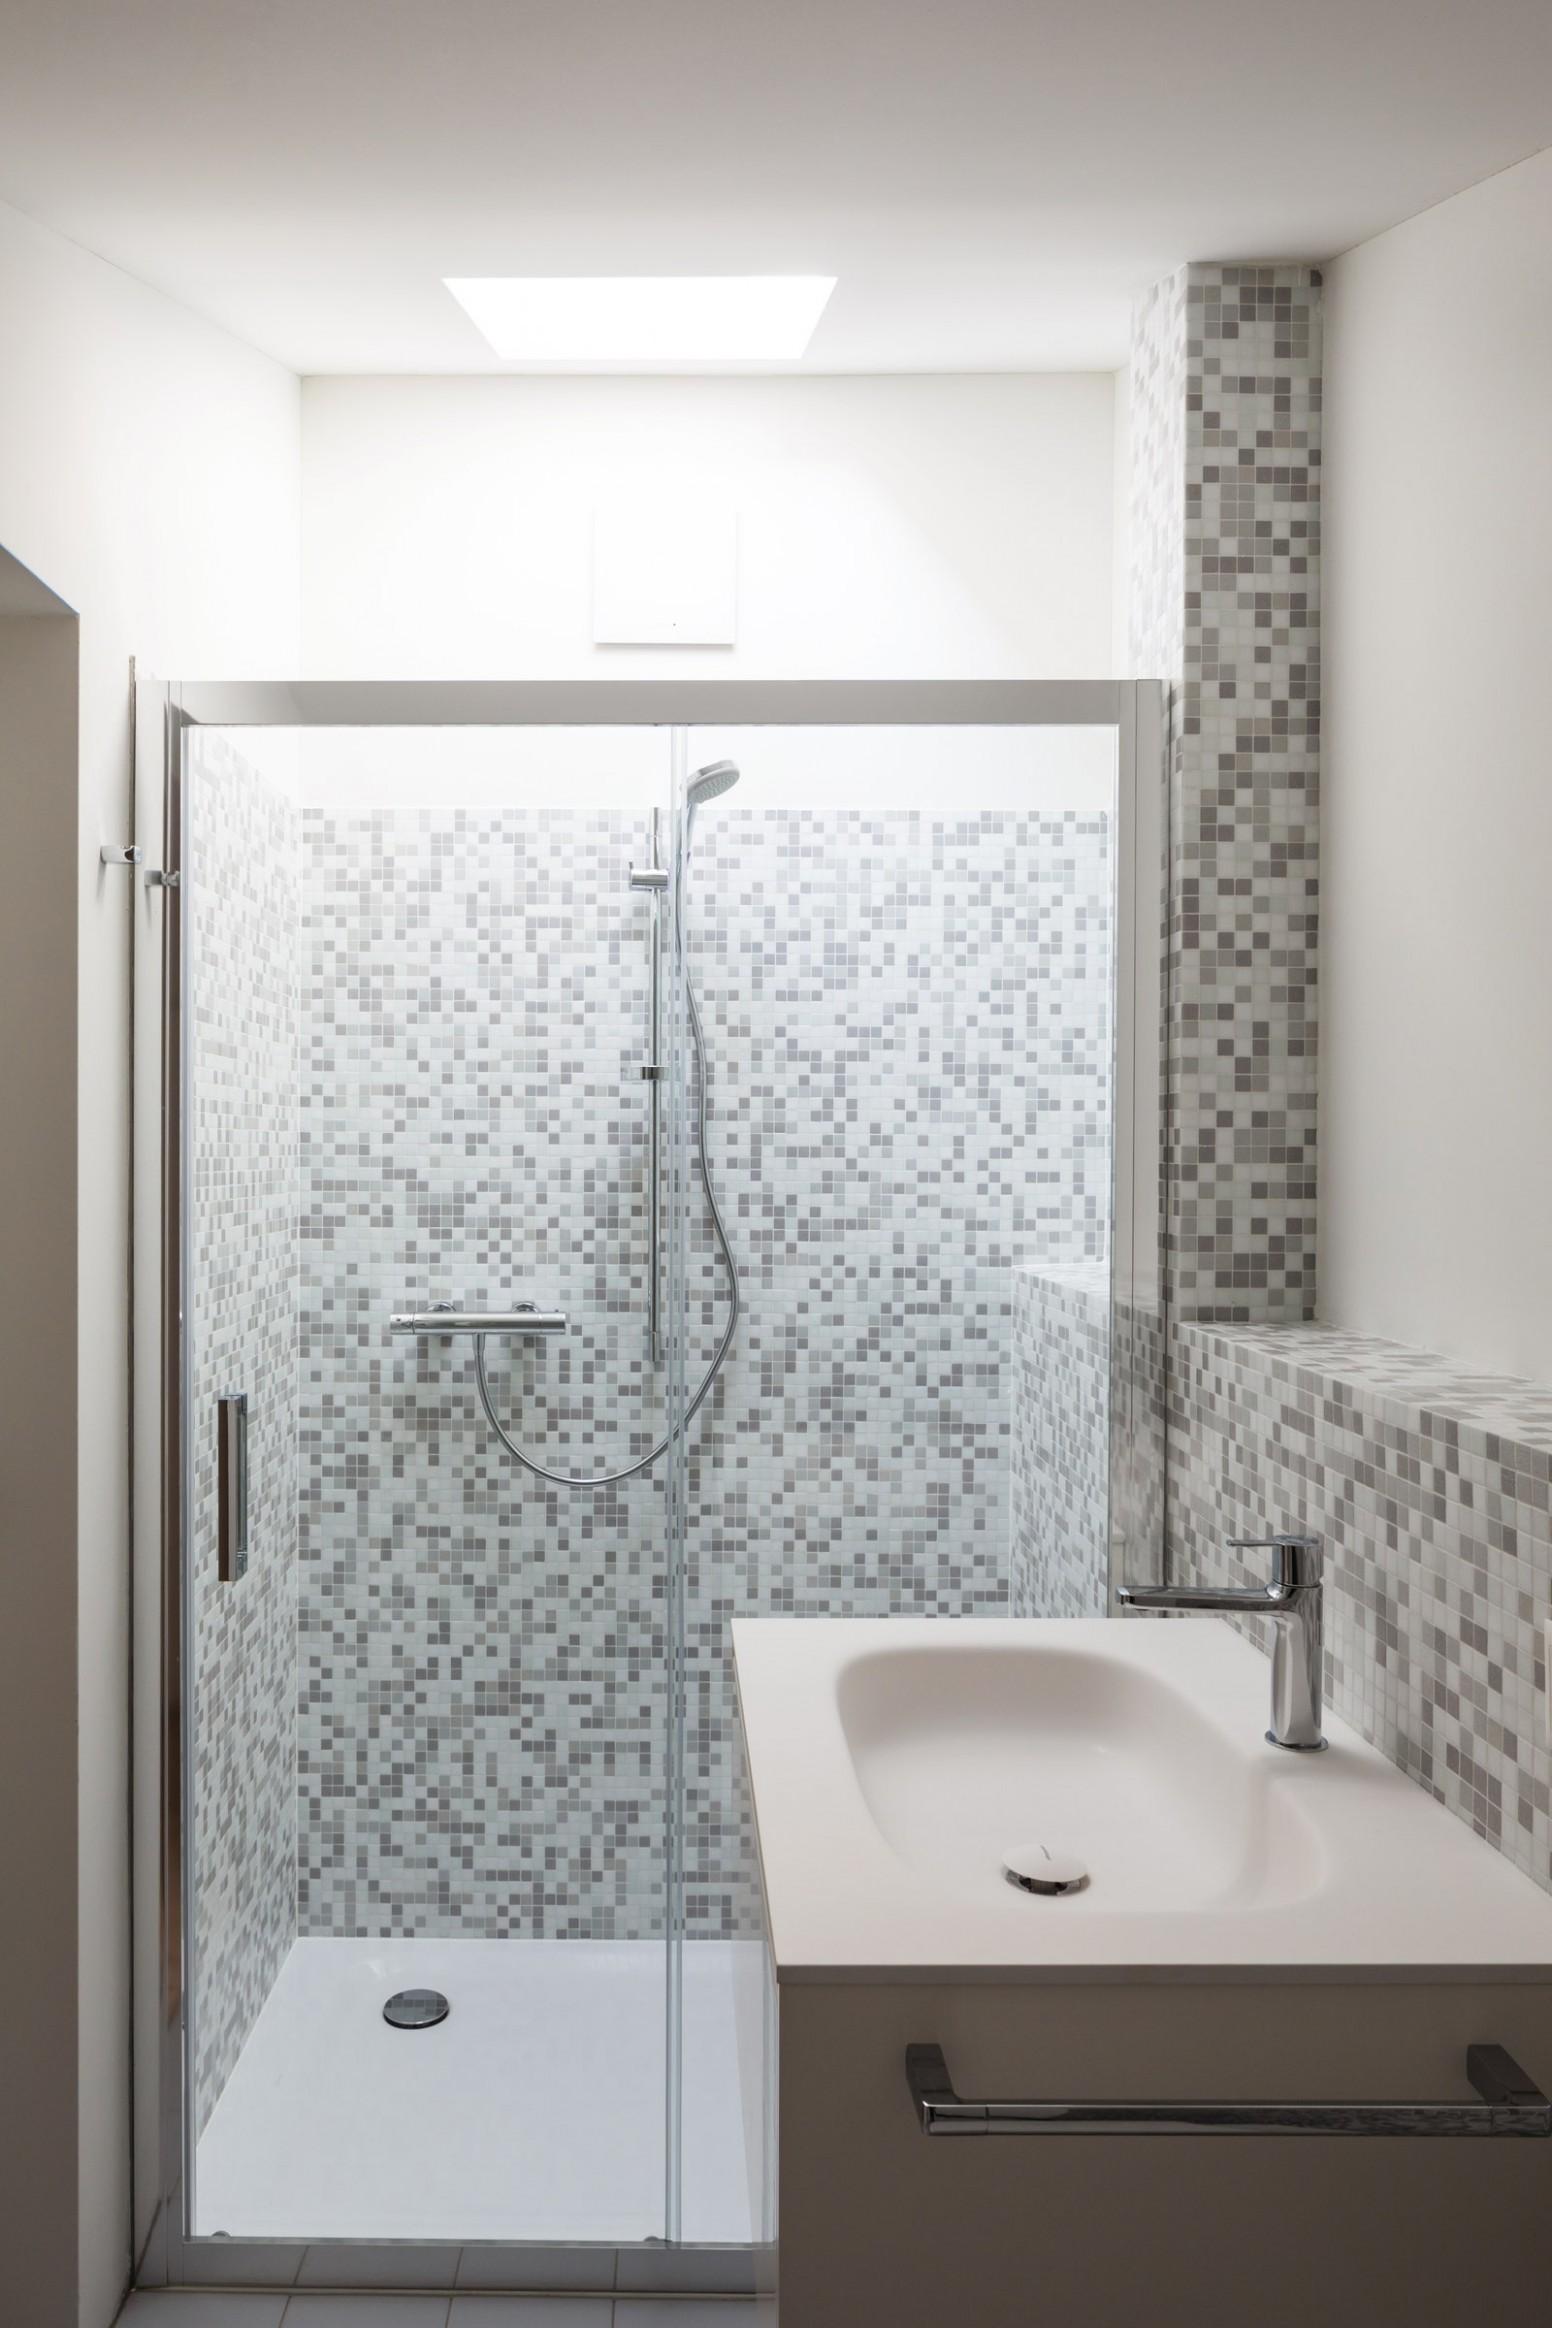 9 Small Bathroom Ideas to Make Your Bathroom Feel Bigger  - Small Apartment Decorating Ideas Bathroom